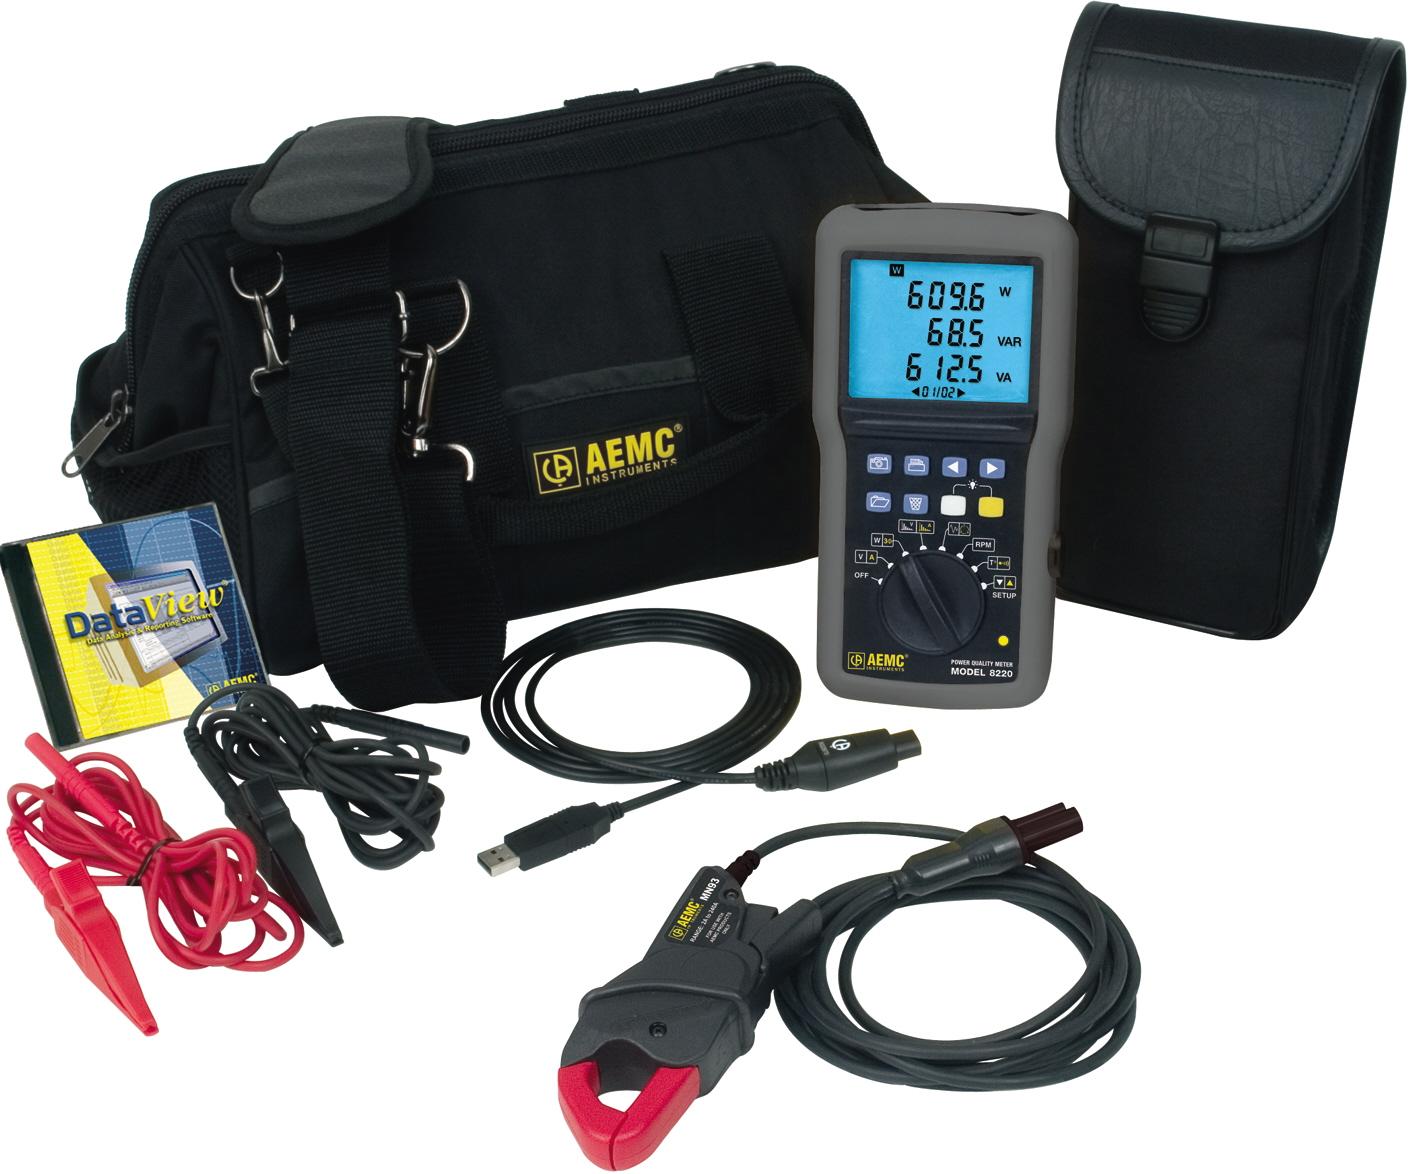 AEMC Instruments 8220 W/MN93-BK